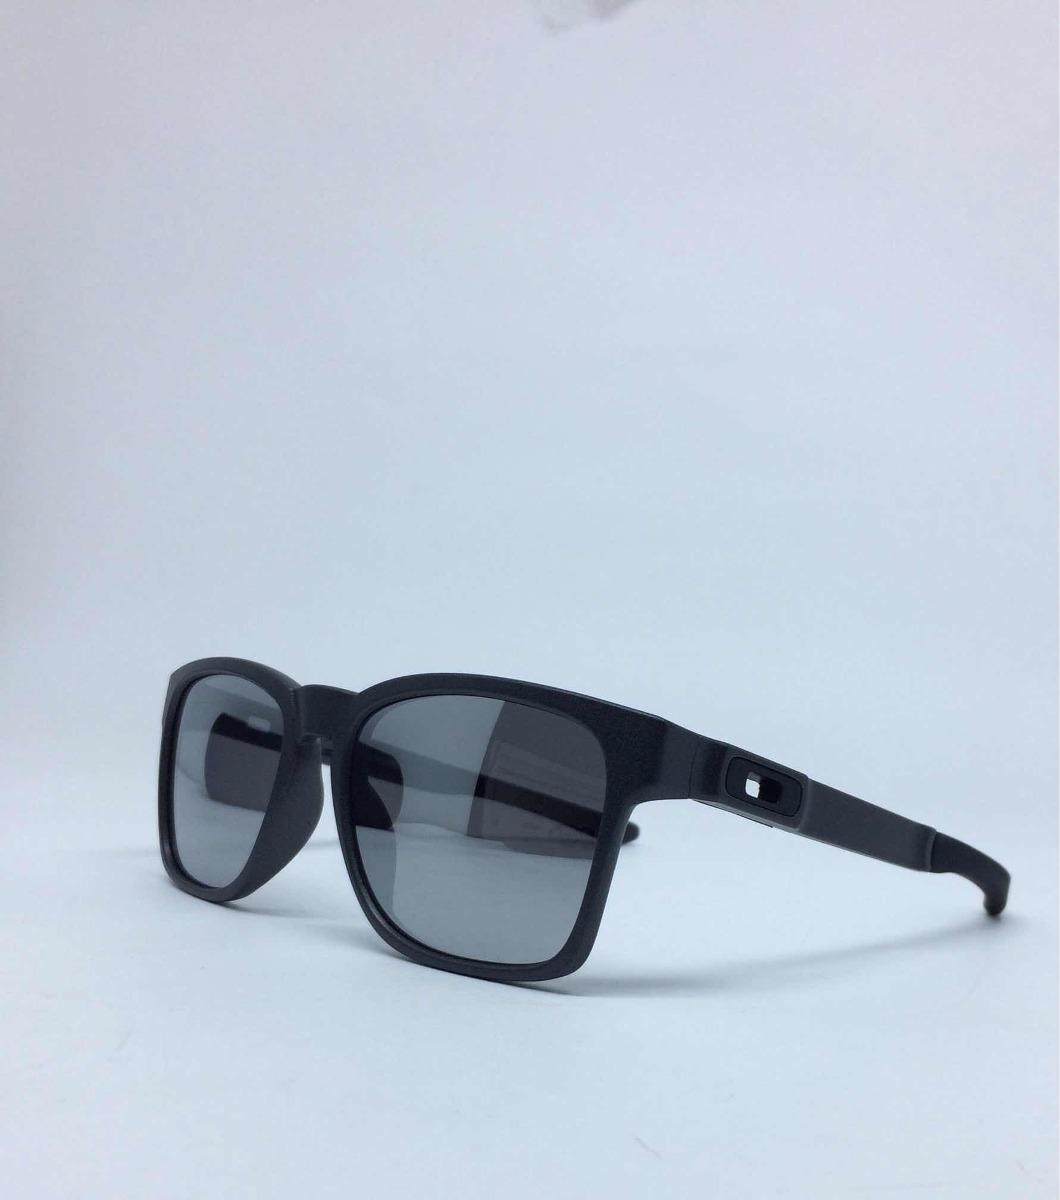 376fd2b52 Oakley Catalyst Óculos Oo9272-03 56 17 144 - R$ 399,99 em Mercado Livre